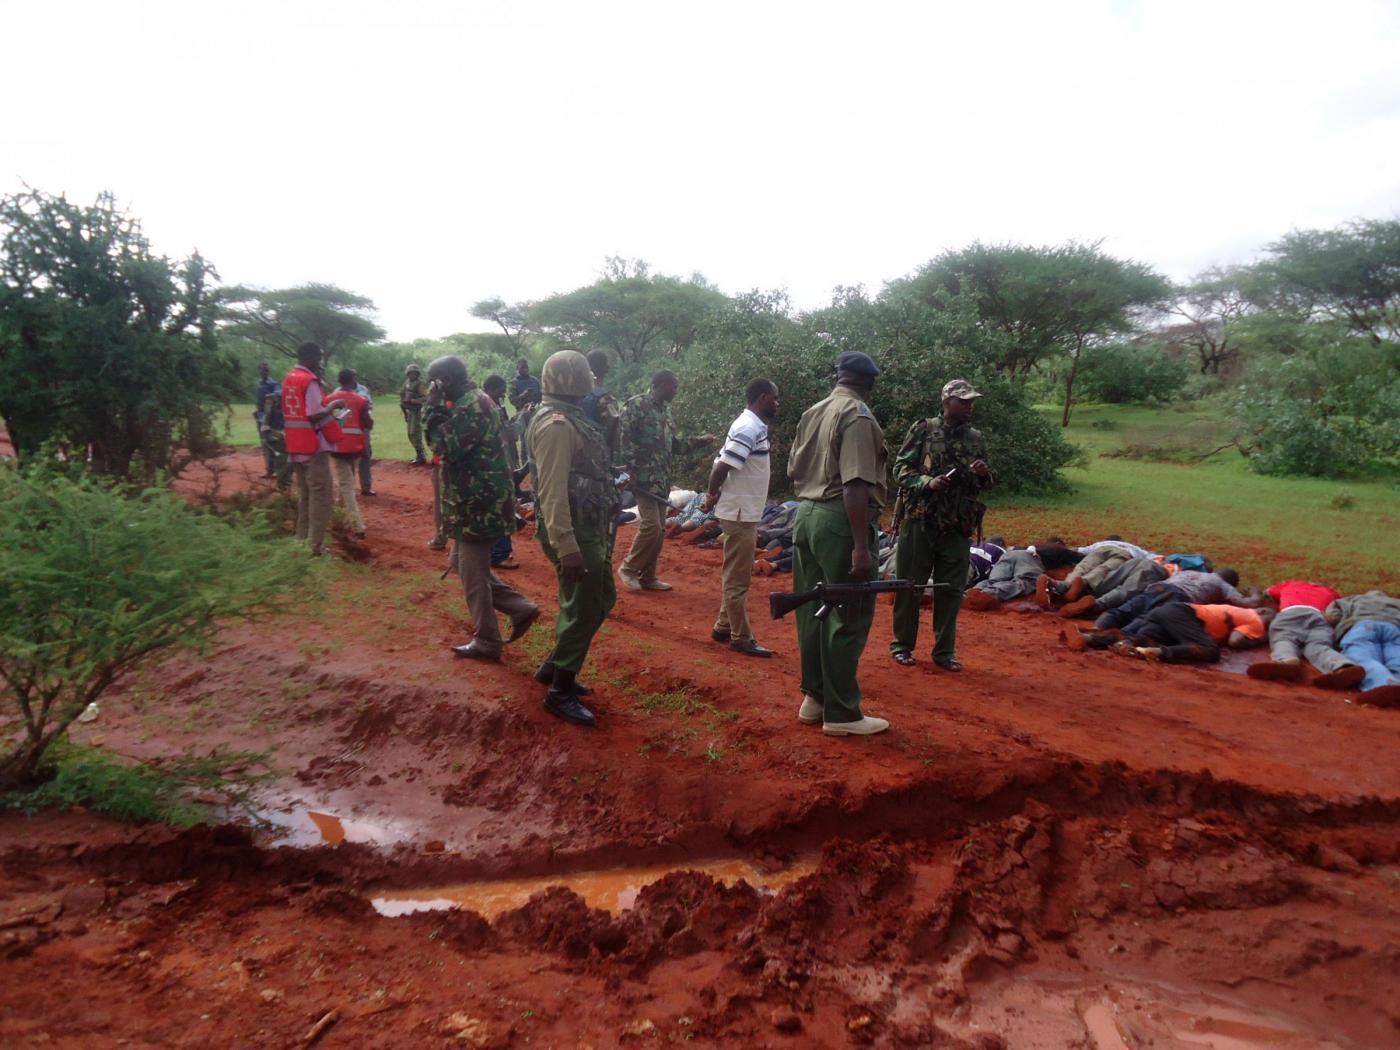 Kenya, Shebab attaccano bus e uccidono 28 'non musulmani'